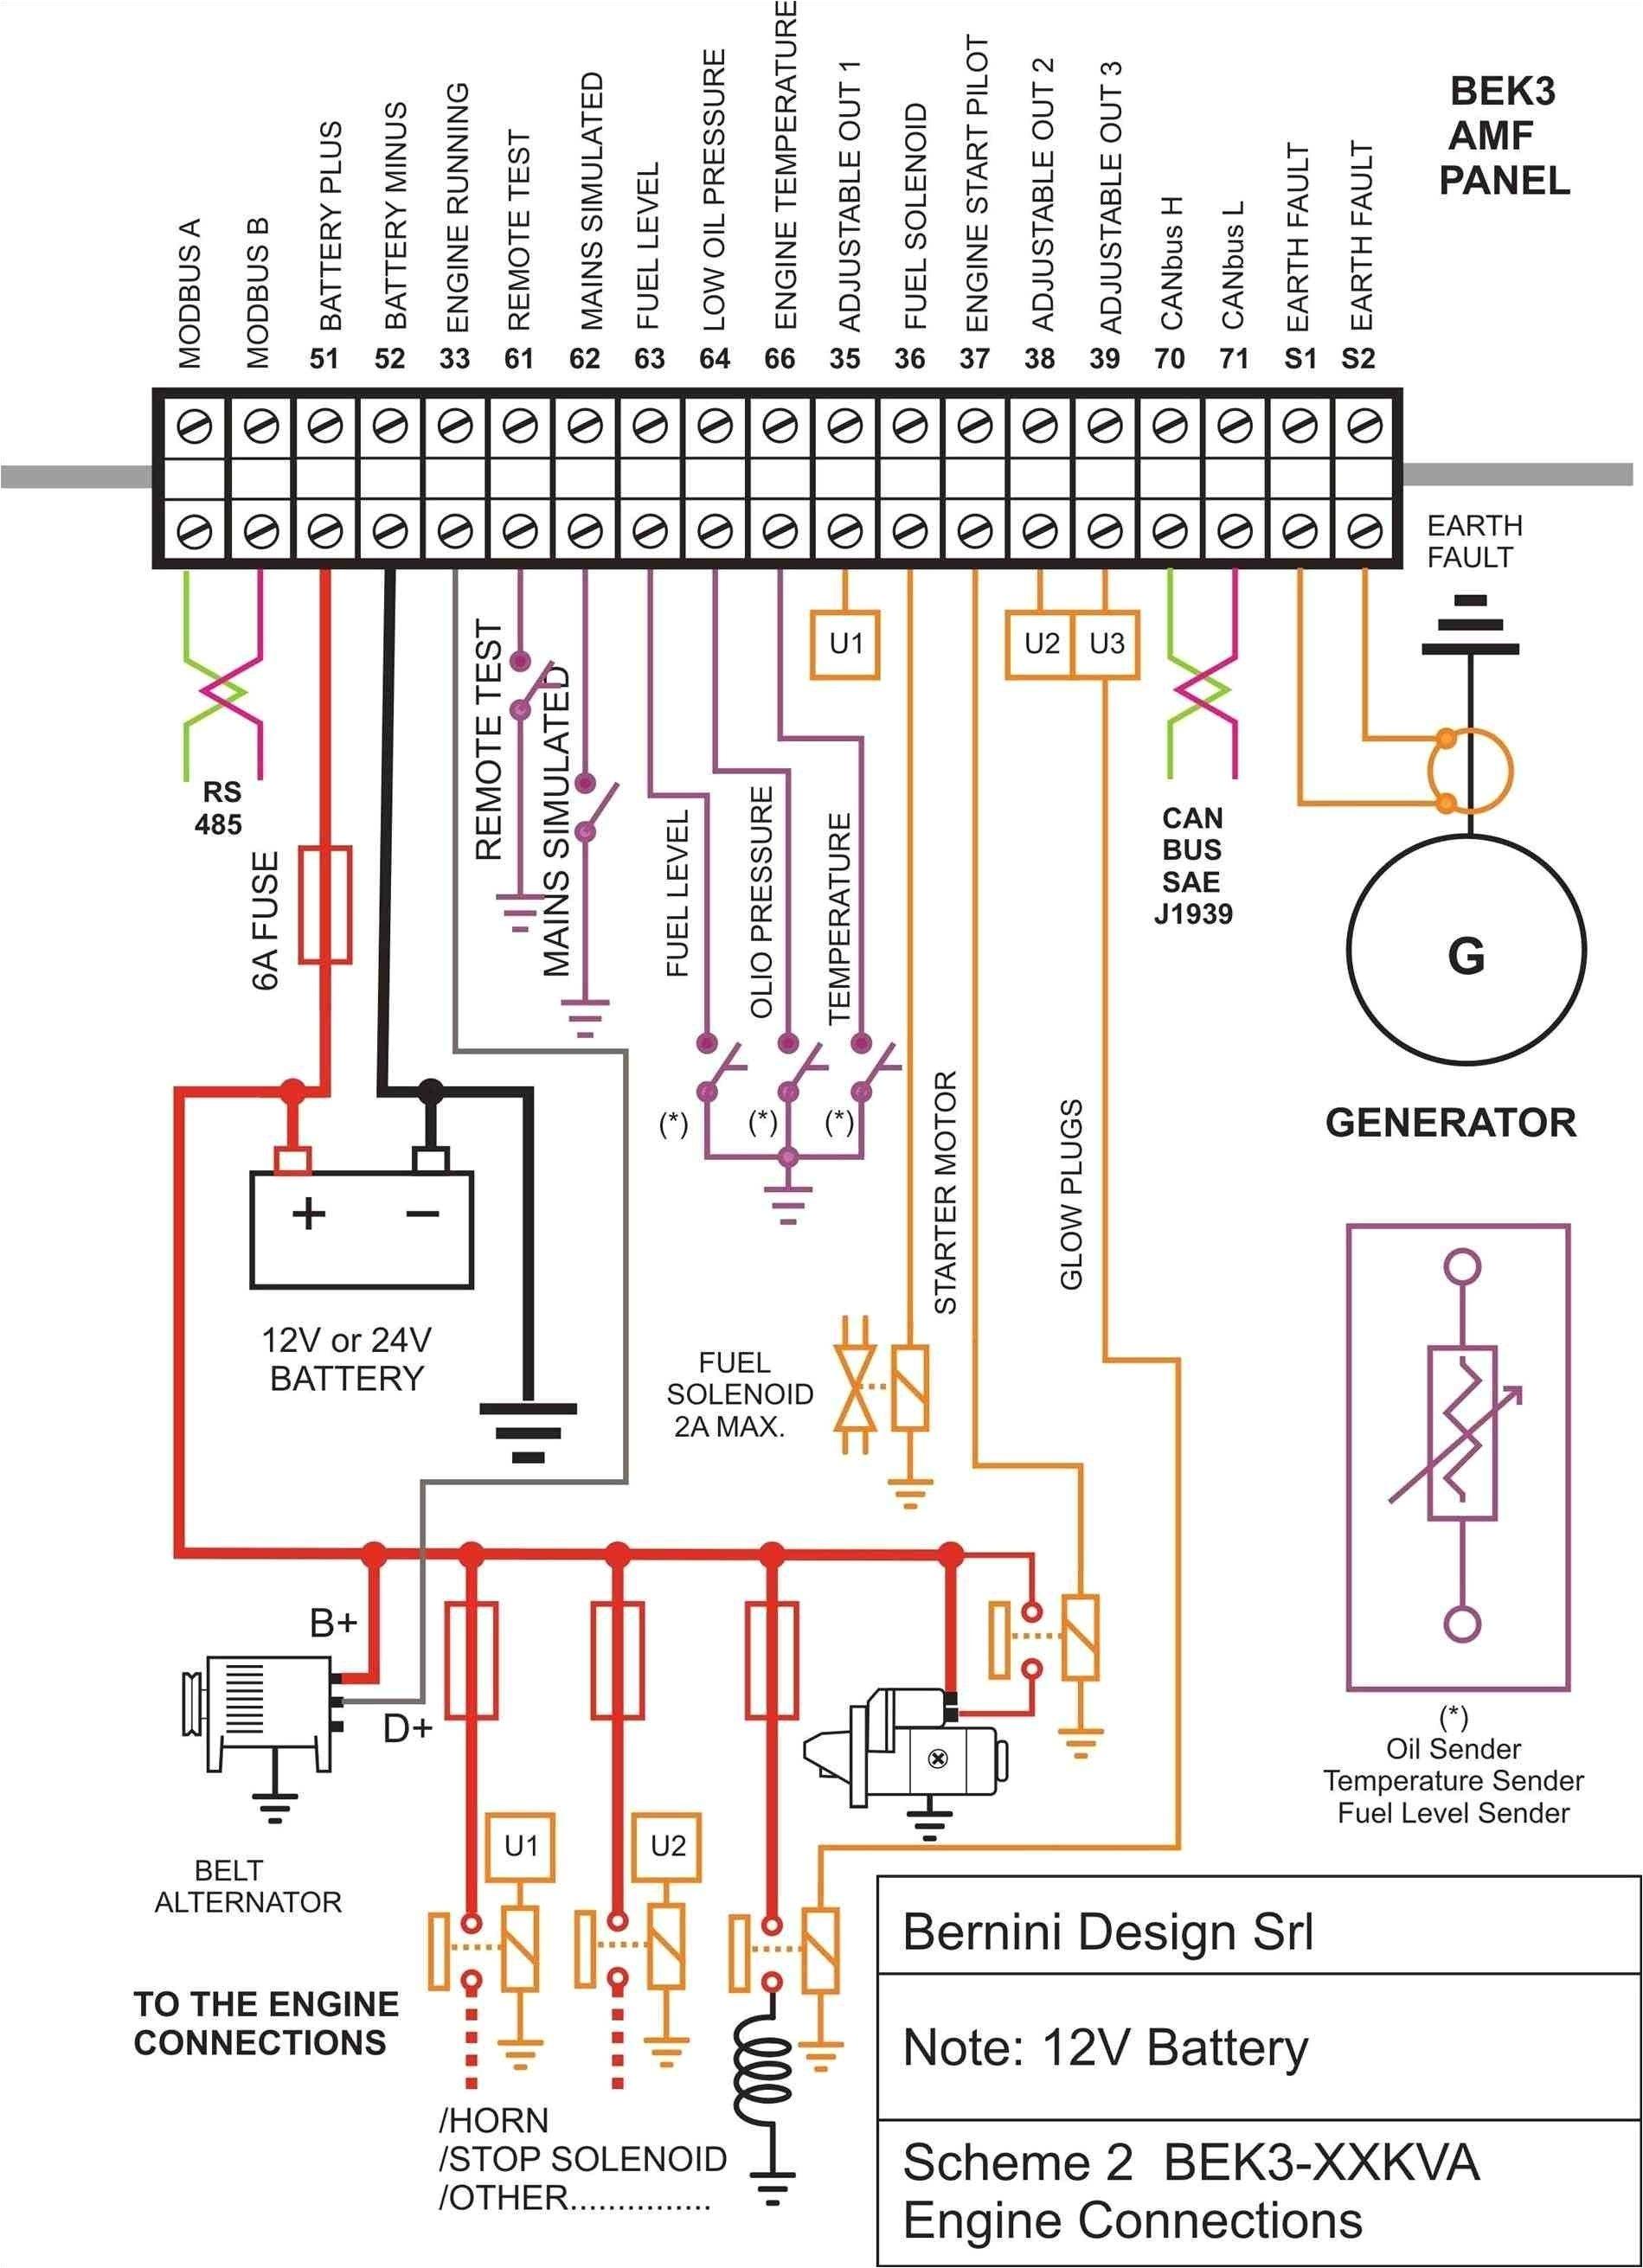 house wiring circuit diagram pdf fresh typical wiring diagram for auto panels main failure pin amf panel circuit diagram on pinterest